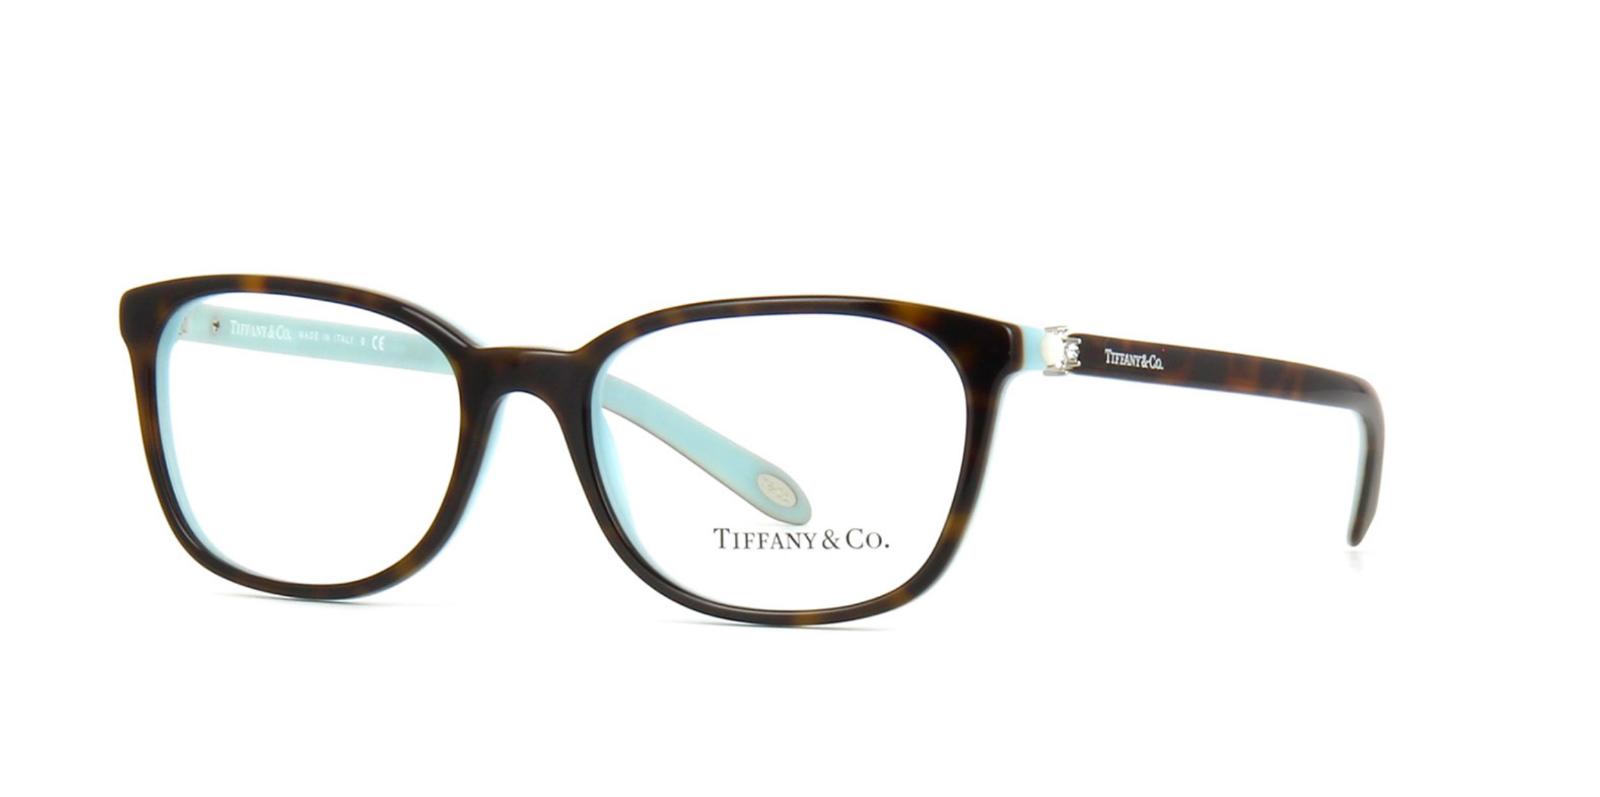 Tiffany & Co. Eyeglass Frame: 20 listings